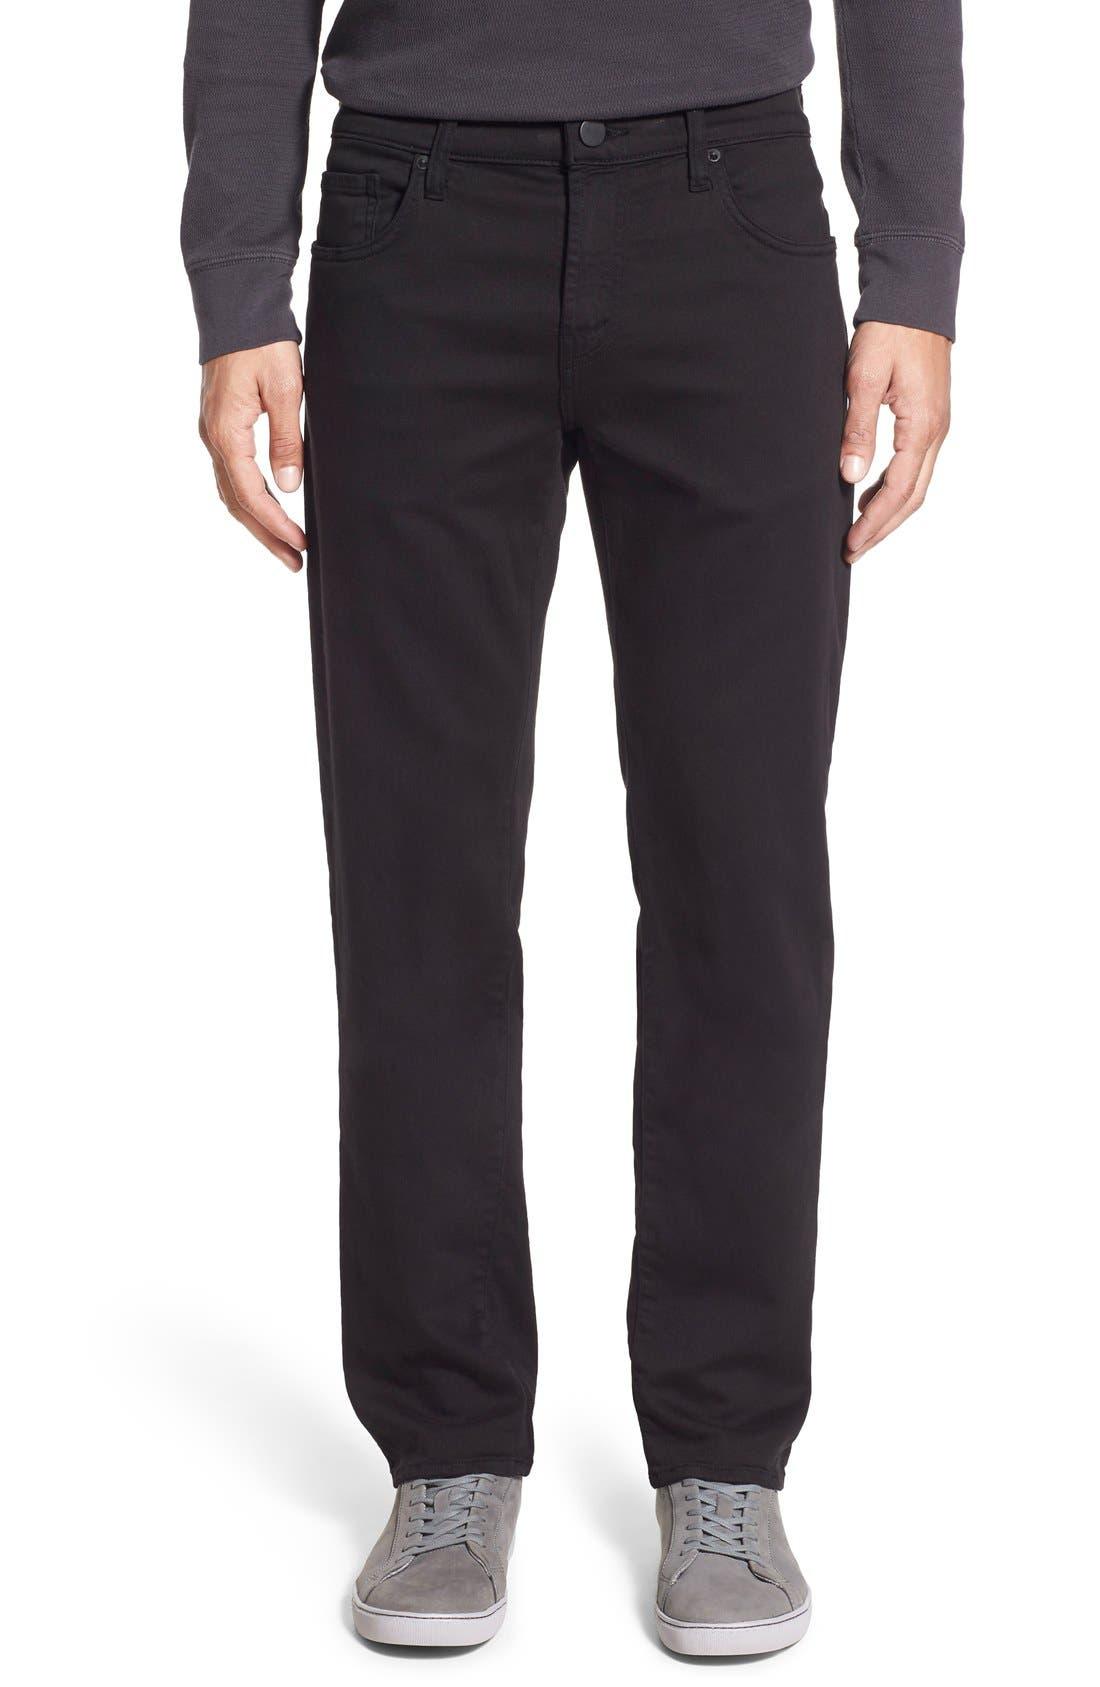 J BRAND 'Kane' Slim Straight Leg Jeans